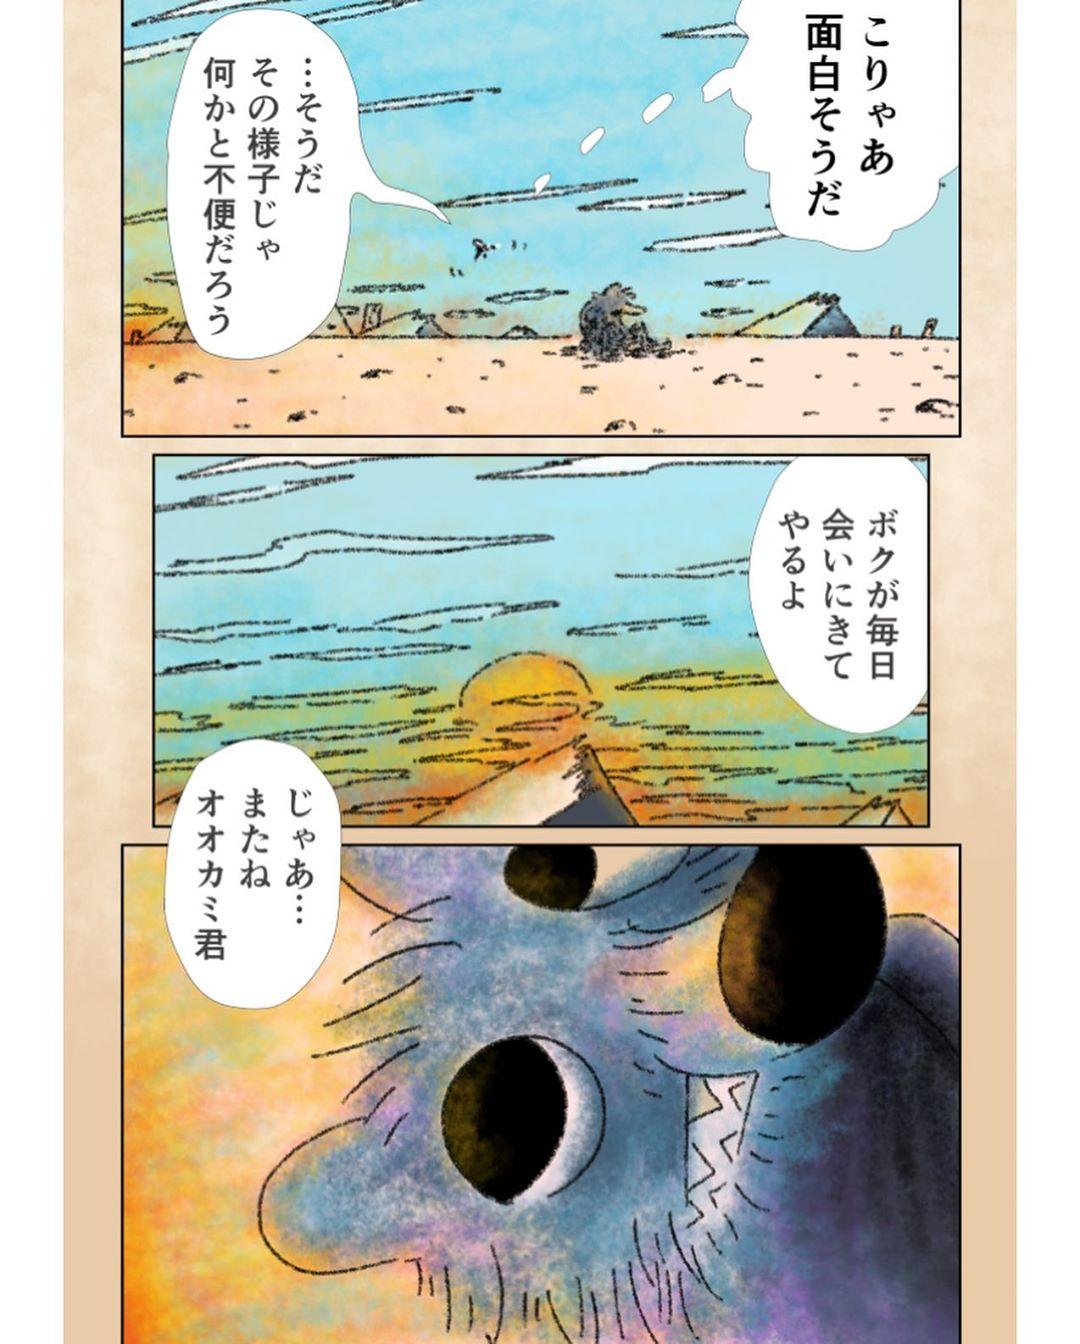 shitara_ryo_tacorice88_75516657_3084597324888023_638235577153445252_n